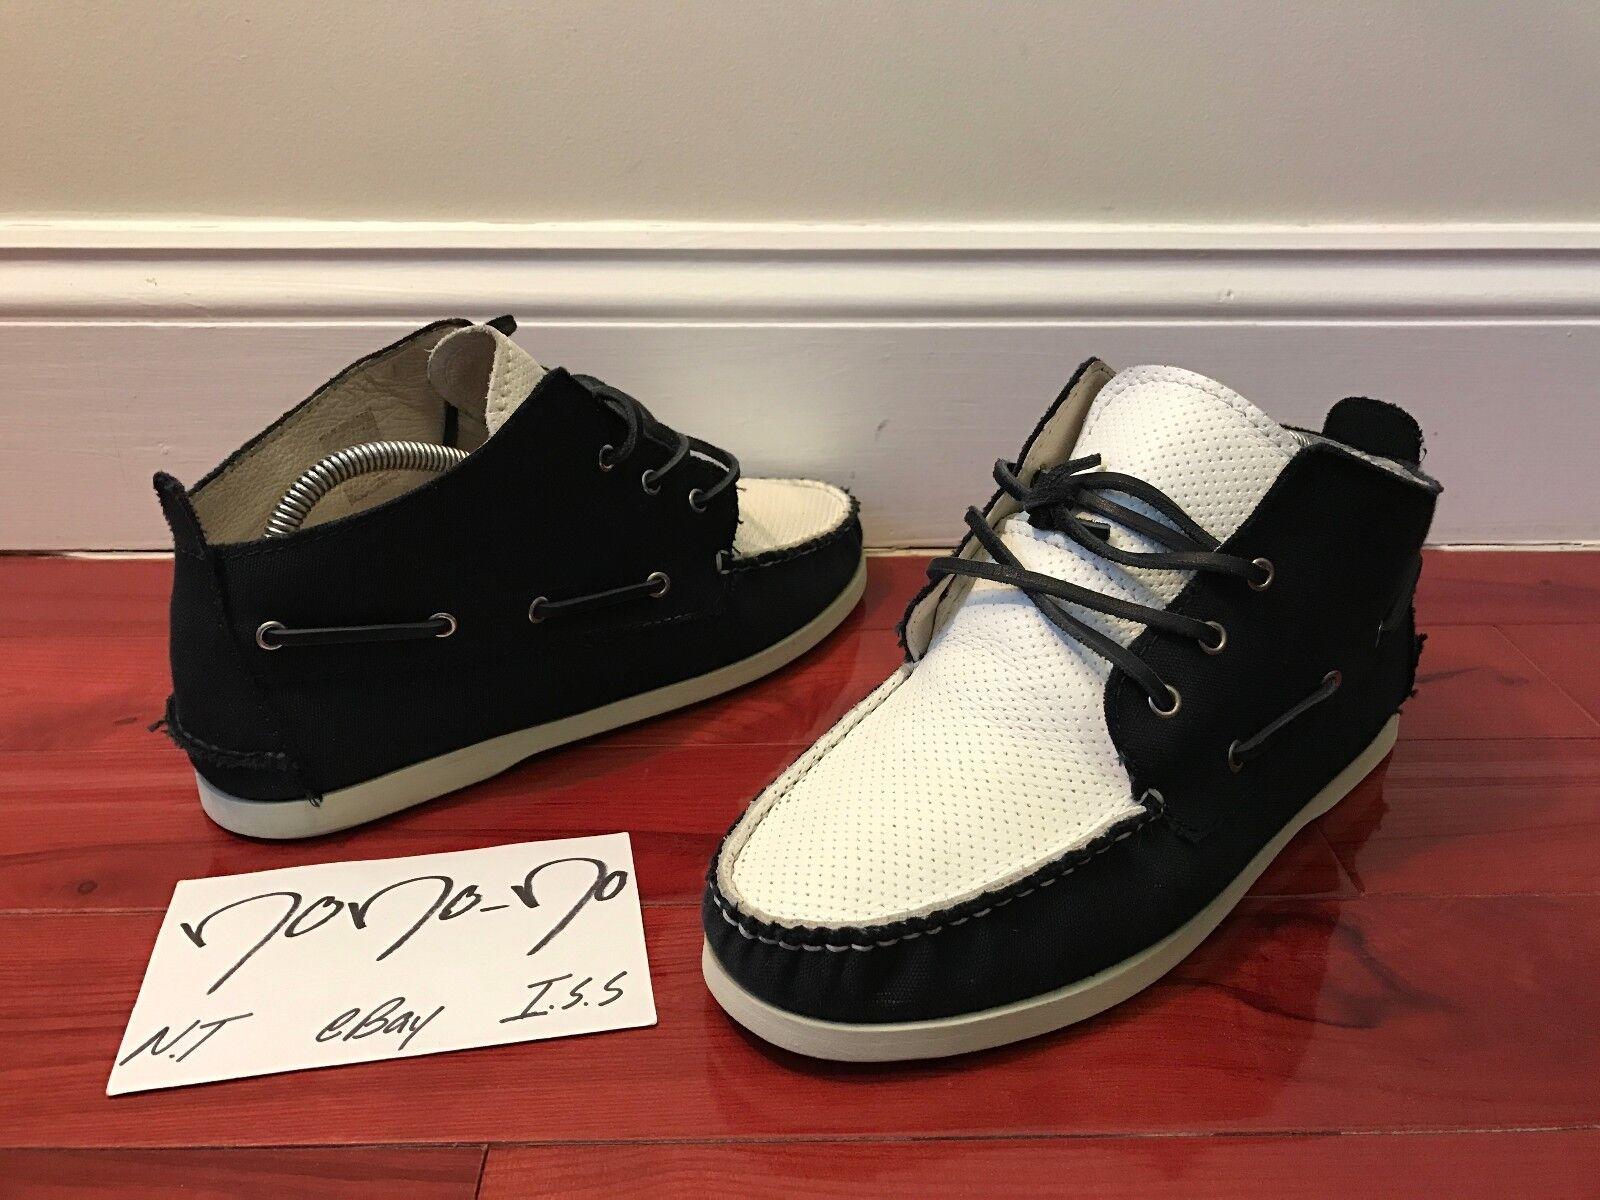 The Generic Man Shoreman Boat Shoe Mid Navy White Mid Shoe Boot size 8 d62d21